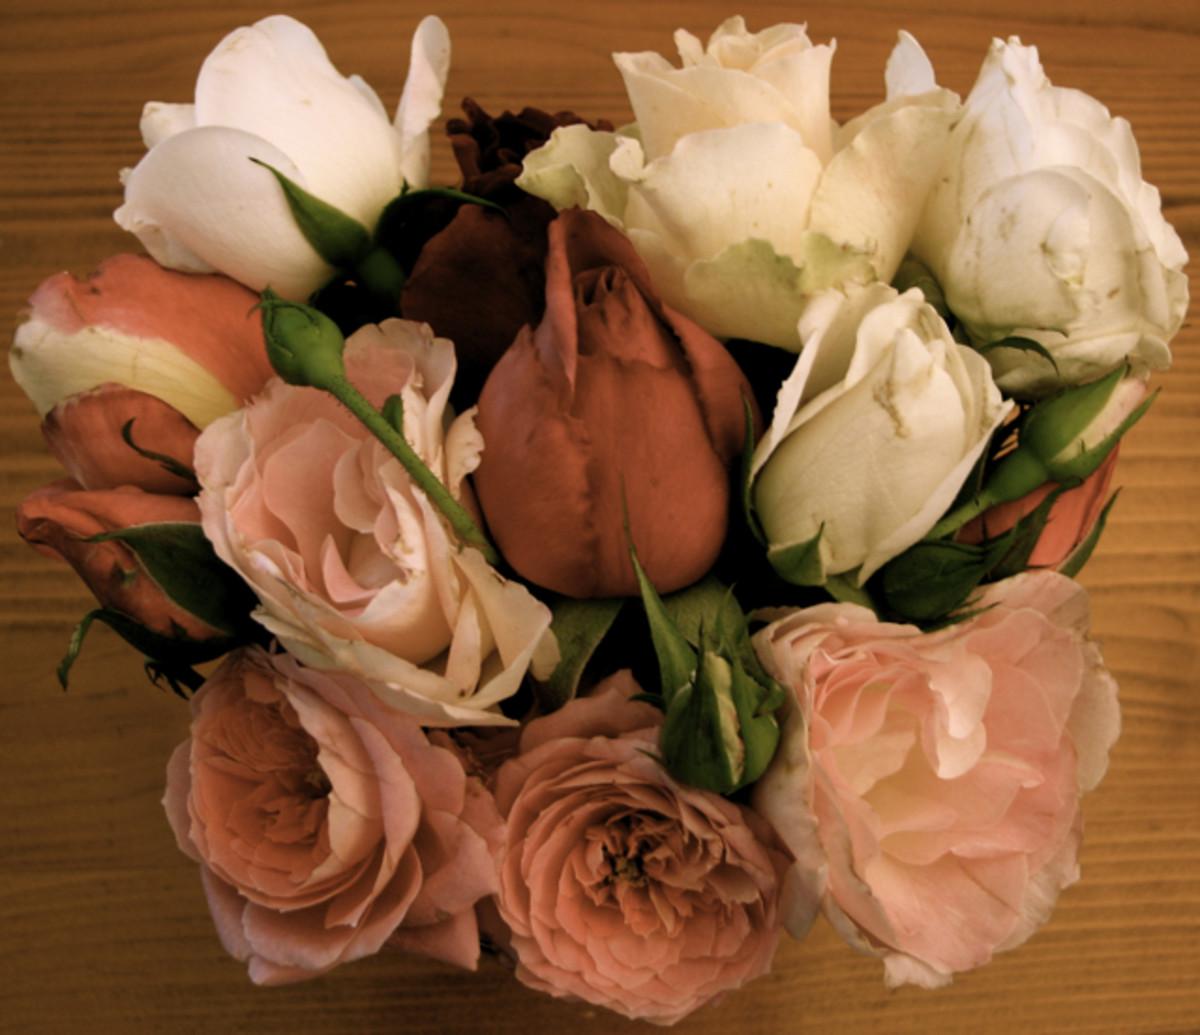 A rose bouquet from my grateful U3A computer students in Warragul.